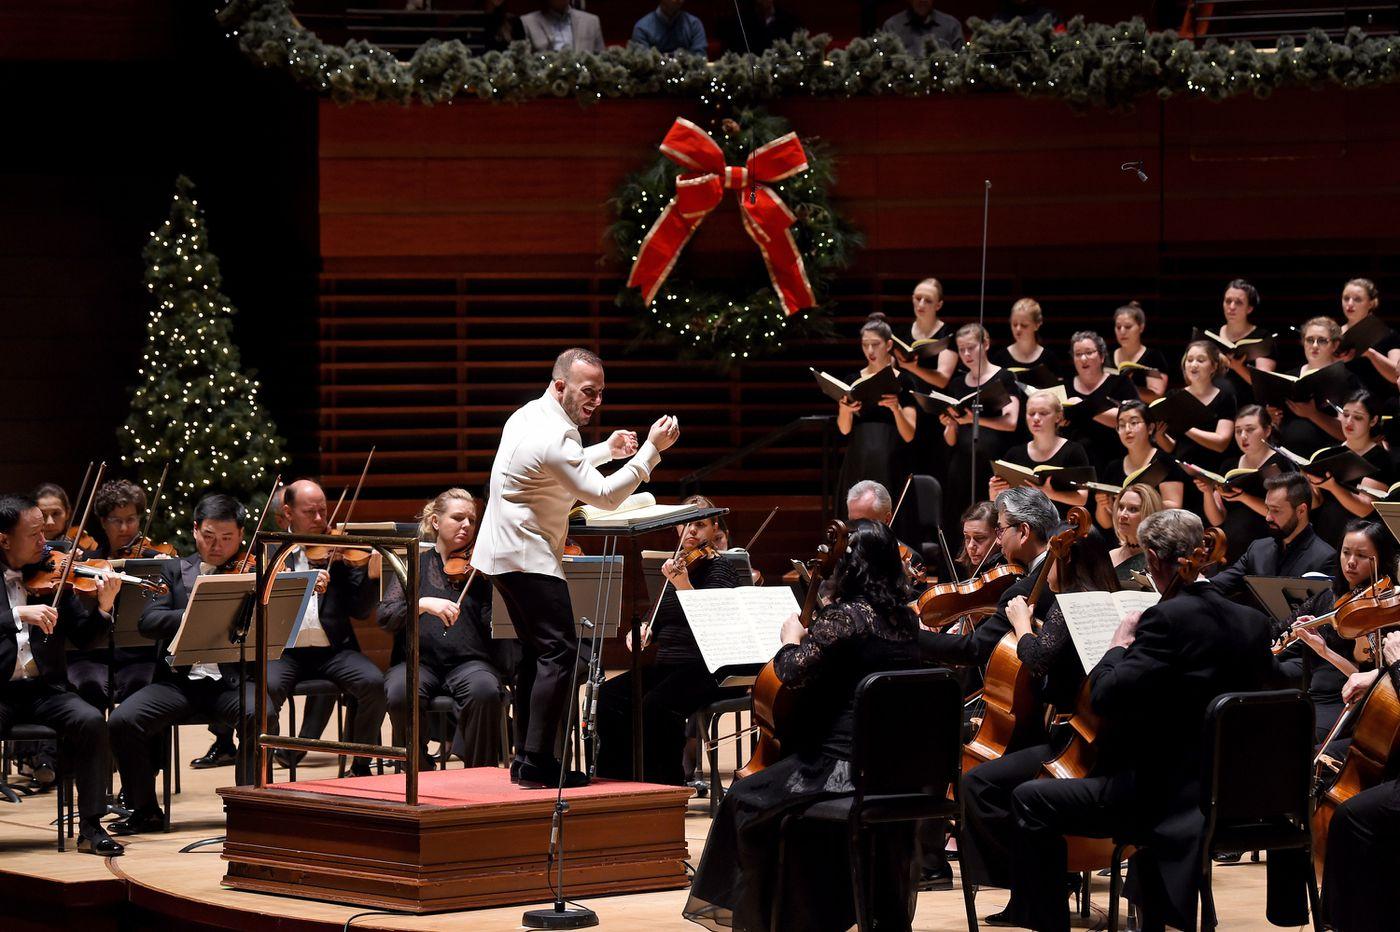 Yannick Nezet-Seguin's Philadelphia Orchestra 'Messiah' picks up where his triumphant 'La Traviata' left off